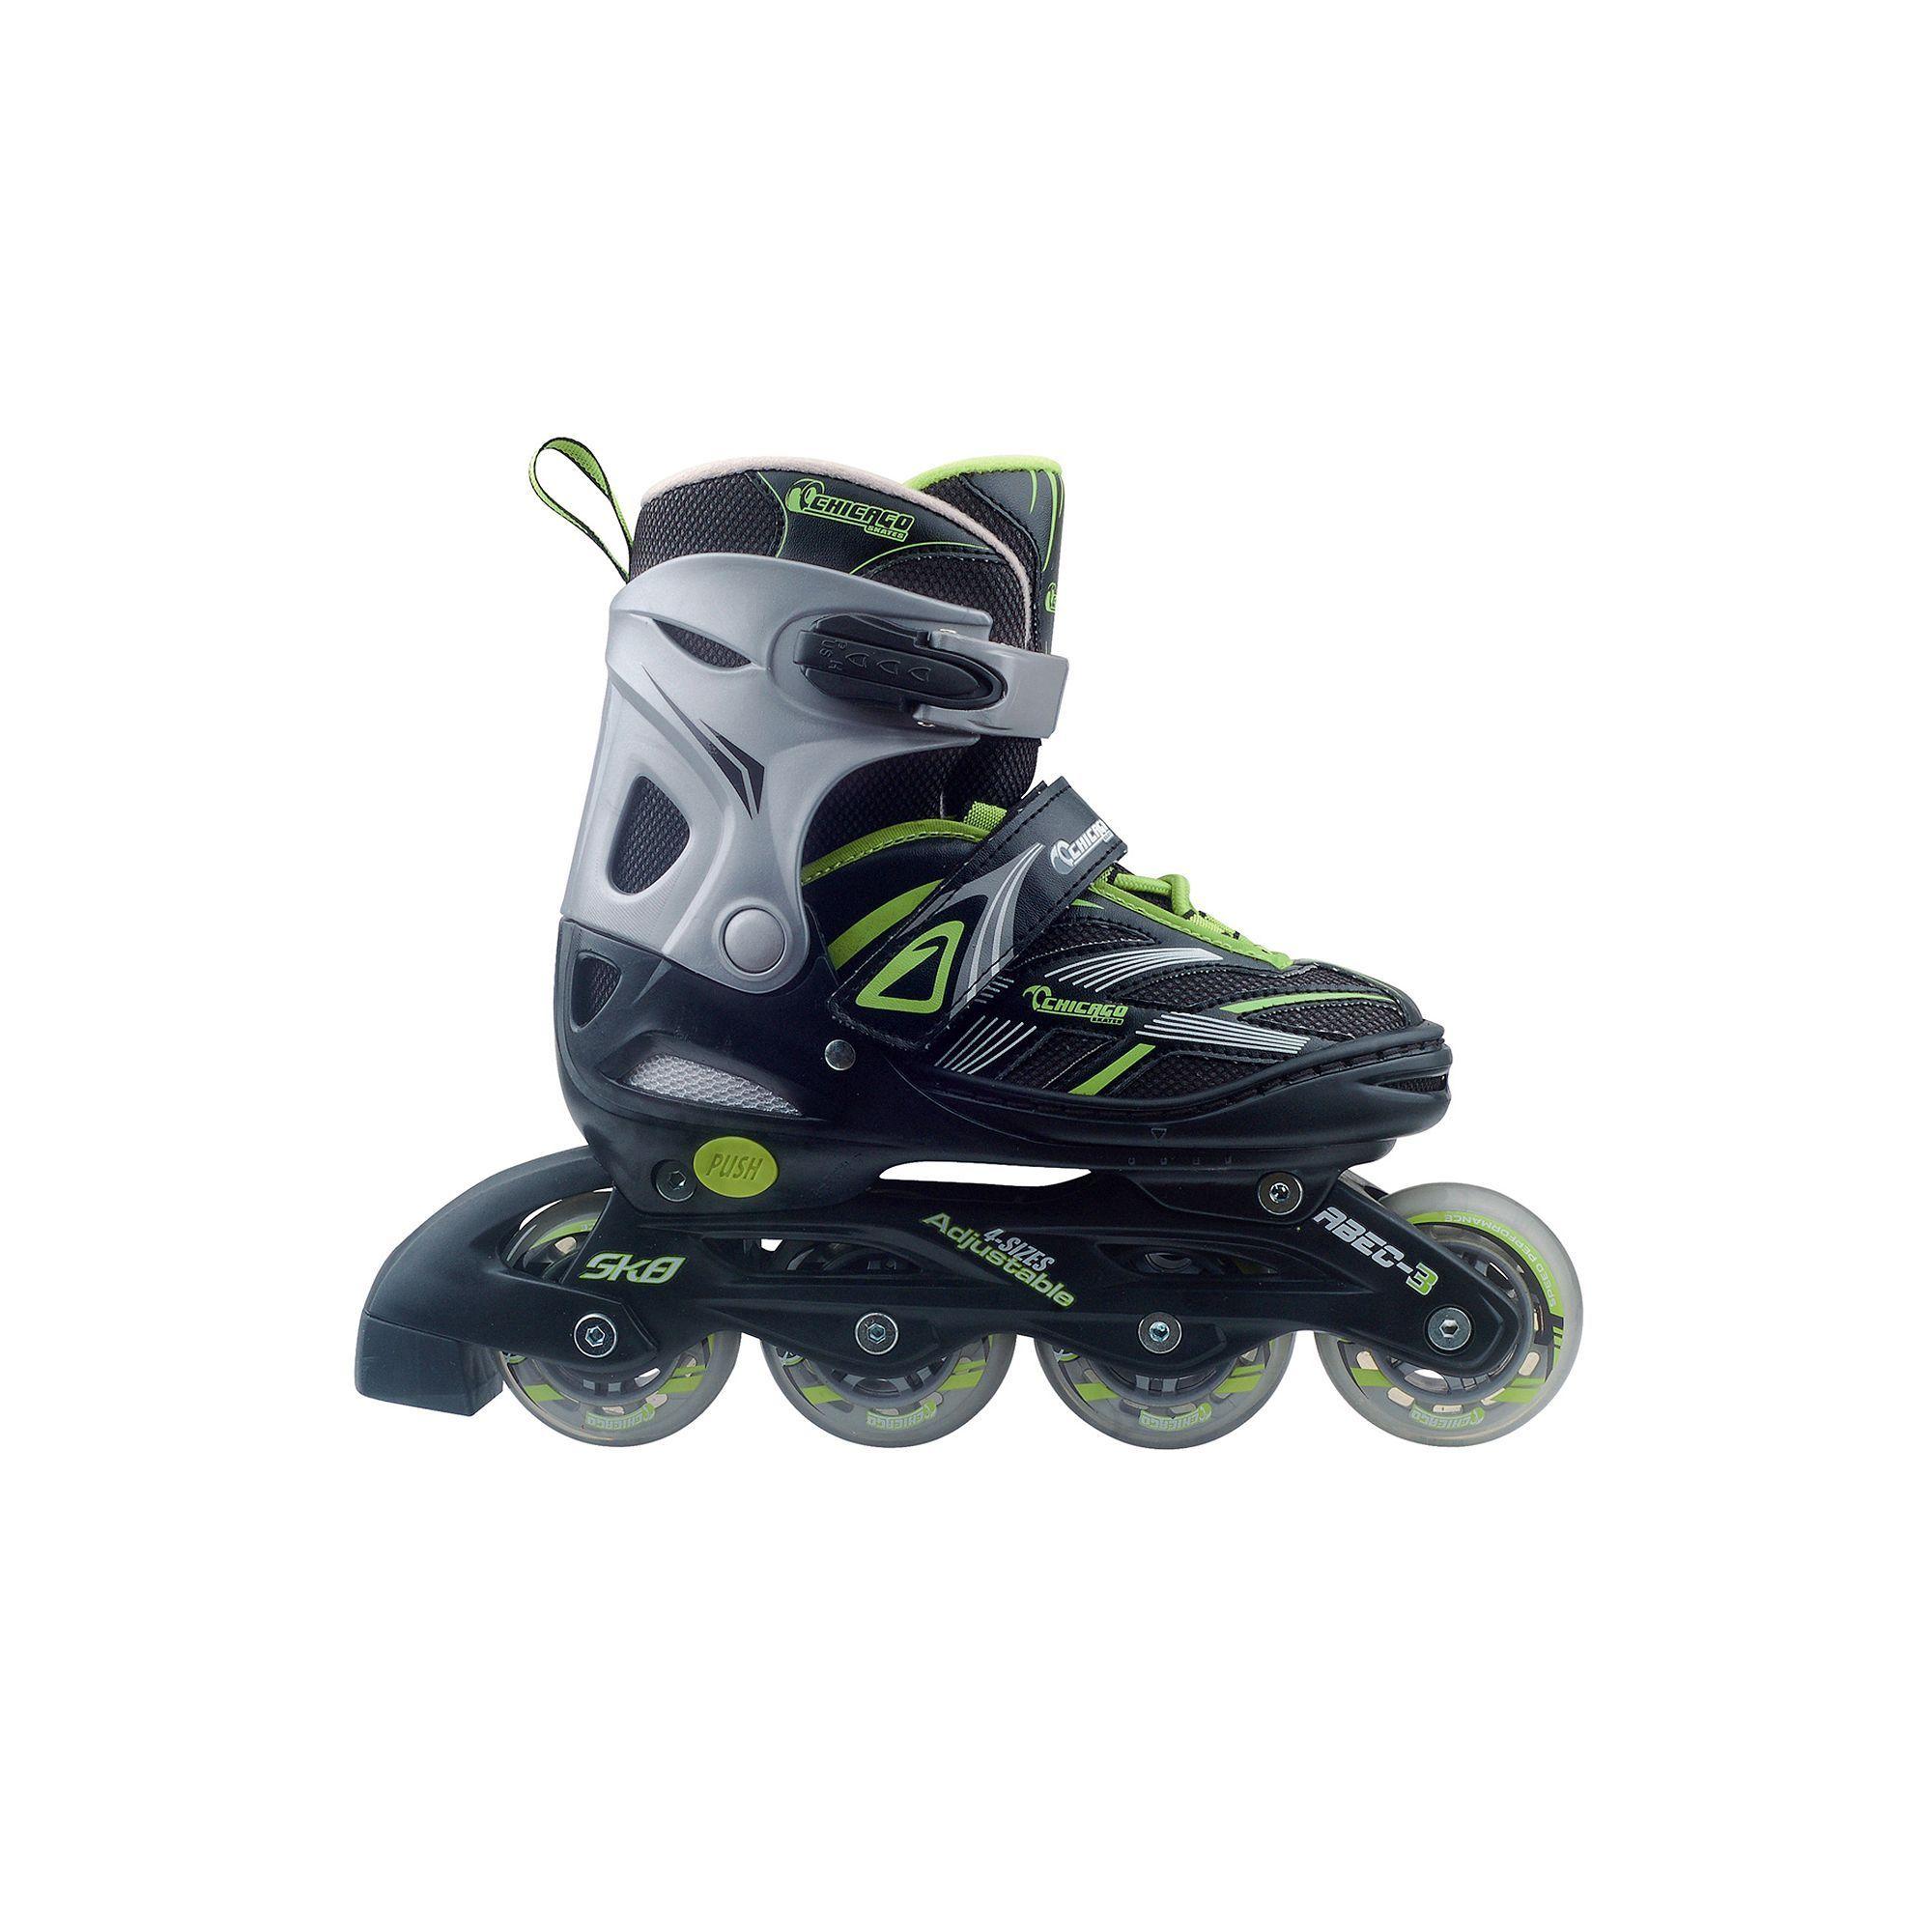 83db636c497 Chicago Skates Blazer Adjustable Inline Skates - Boys | Products ...